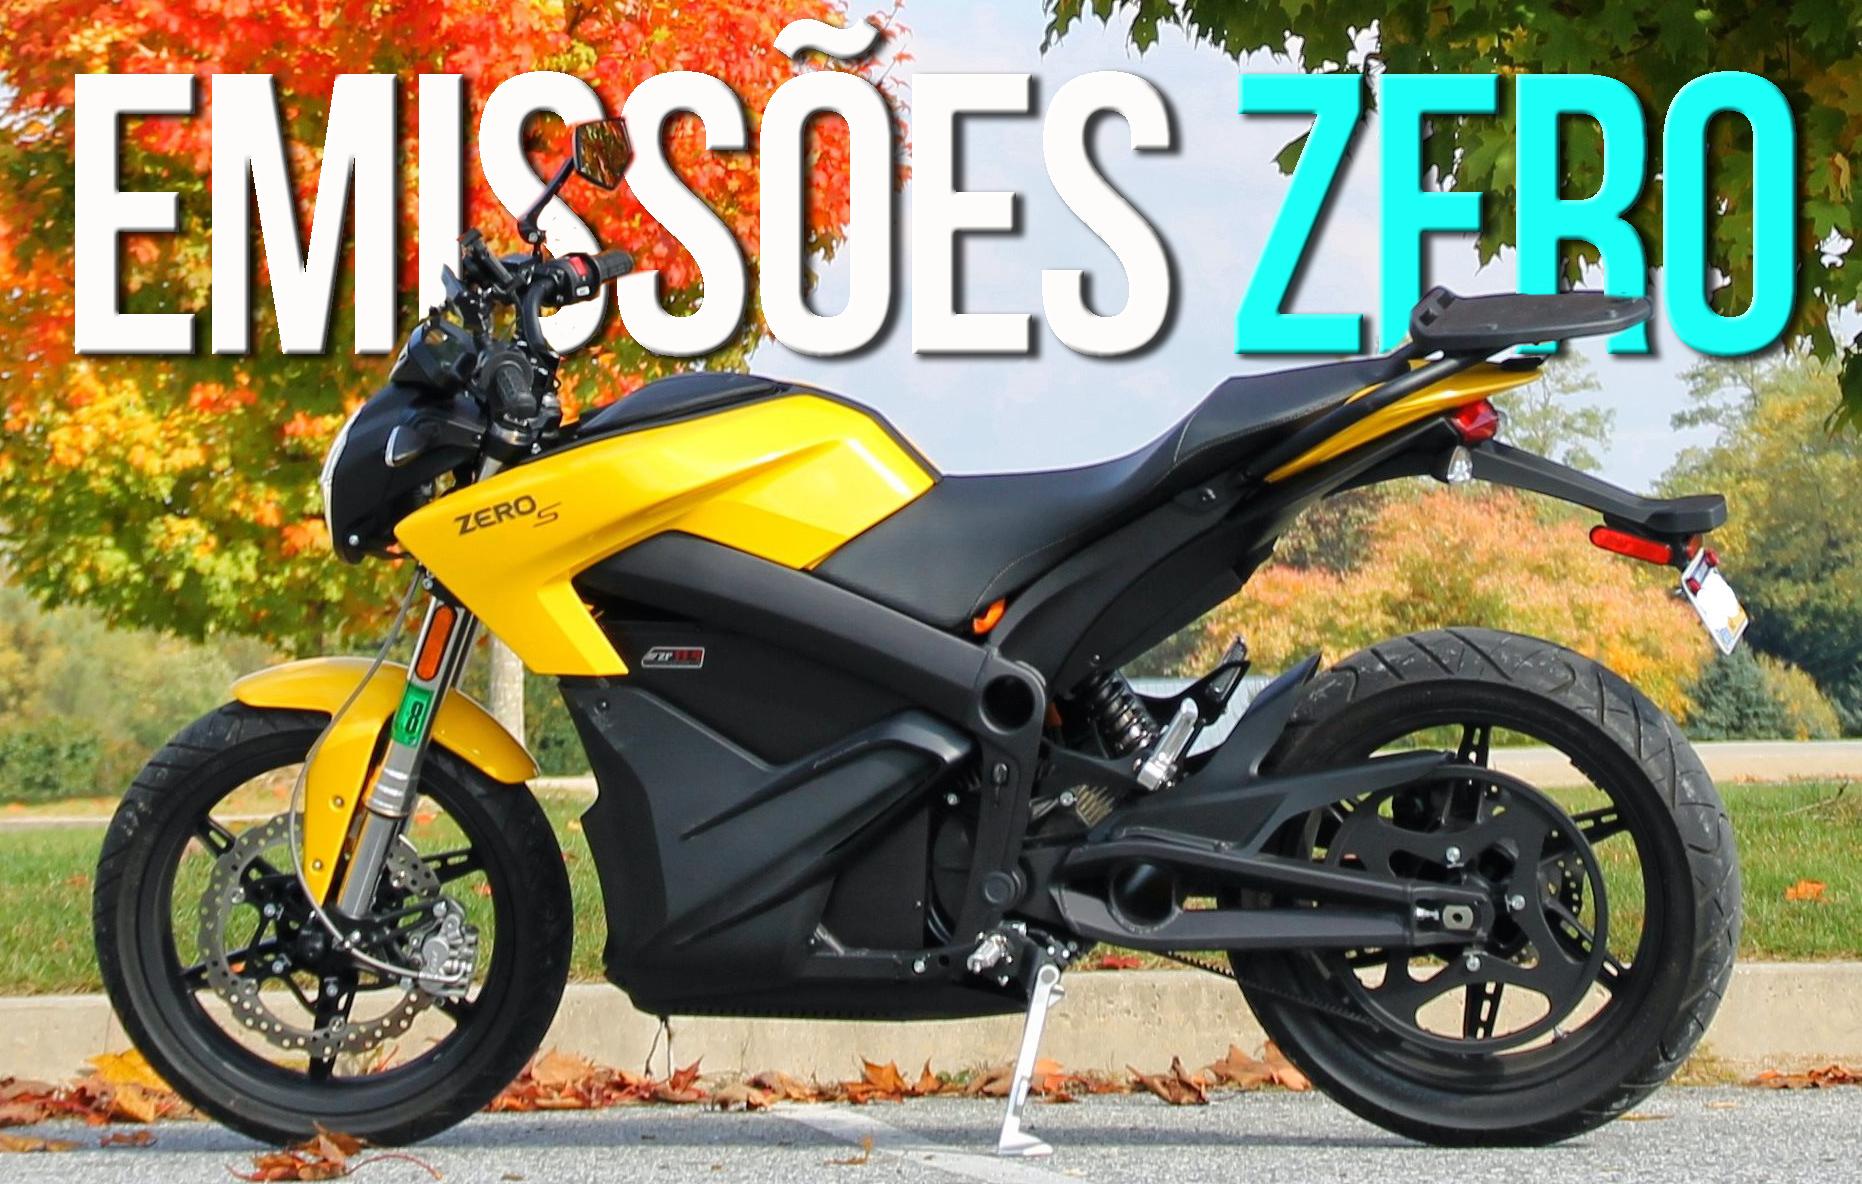 ZERO Motorcycles – Um Futuro com Zero Emissões